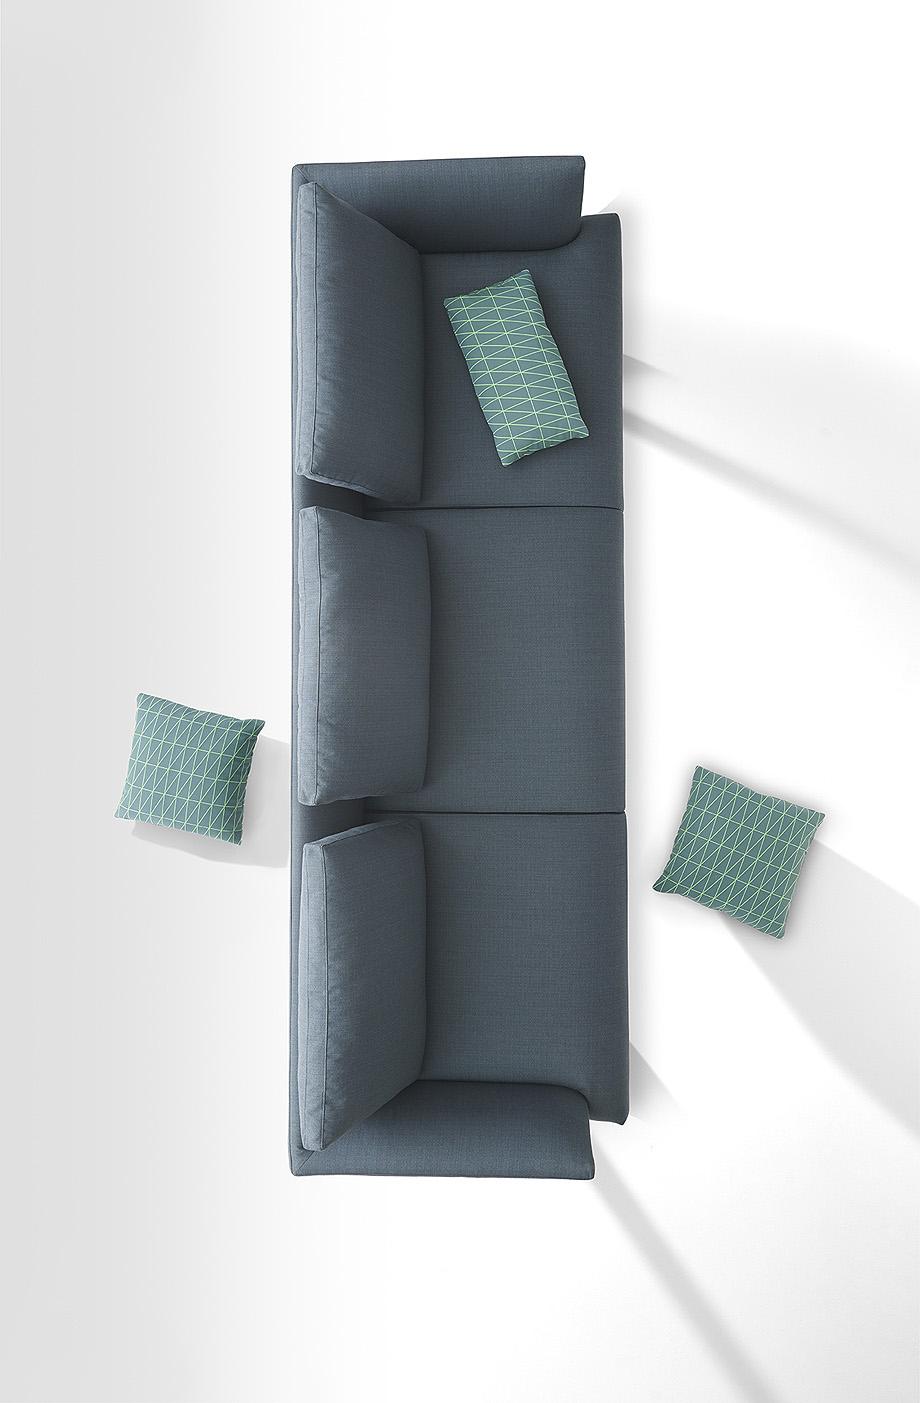 sofa hiro de damian williamson y zanotta - foto miro zagnoli (6)